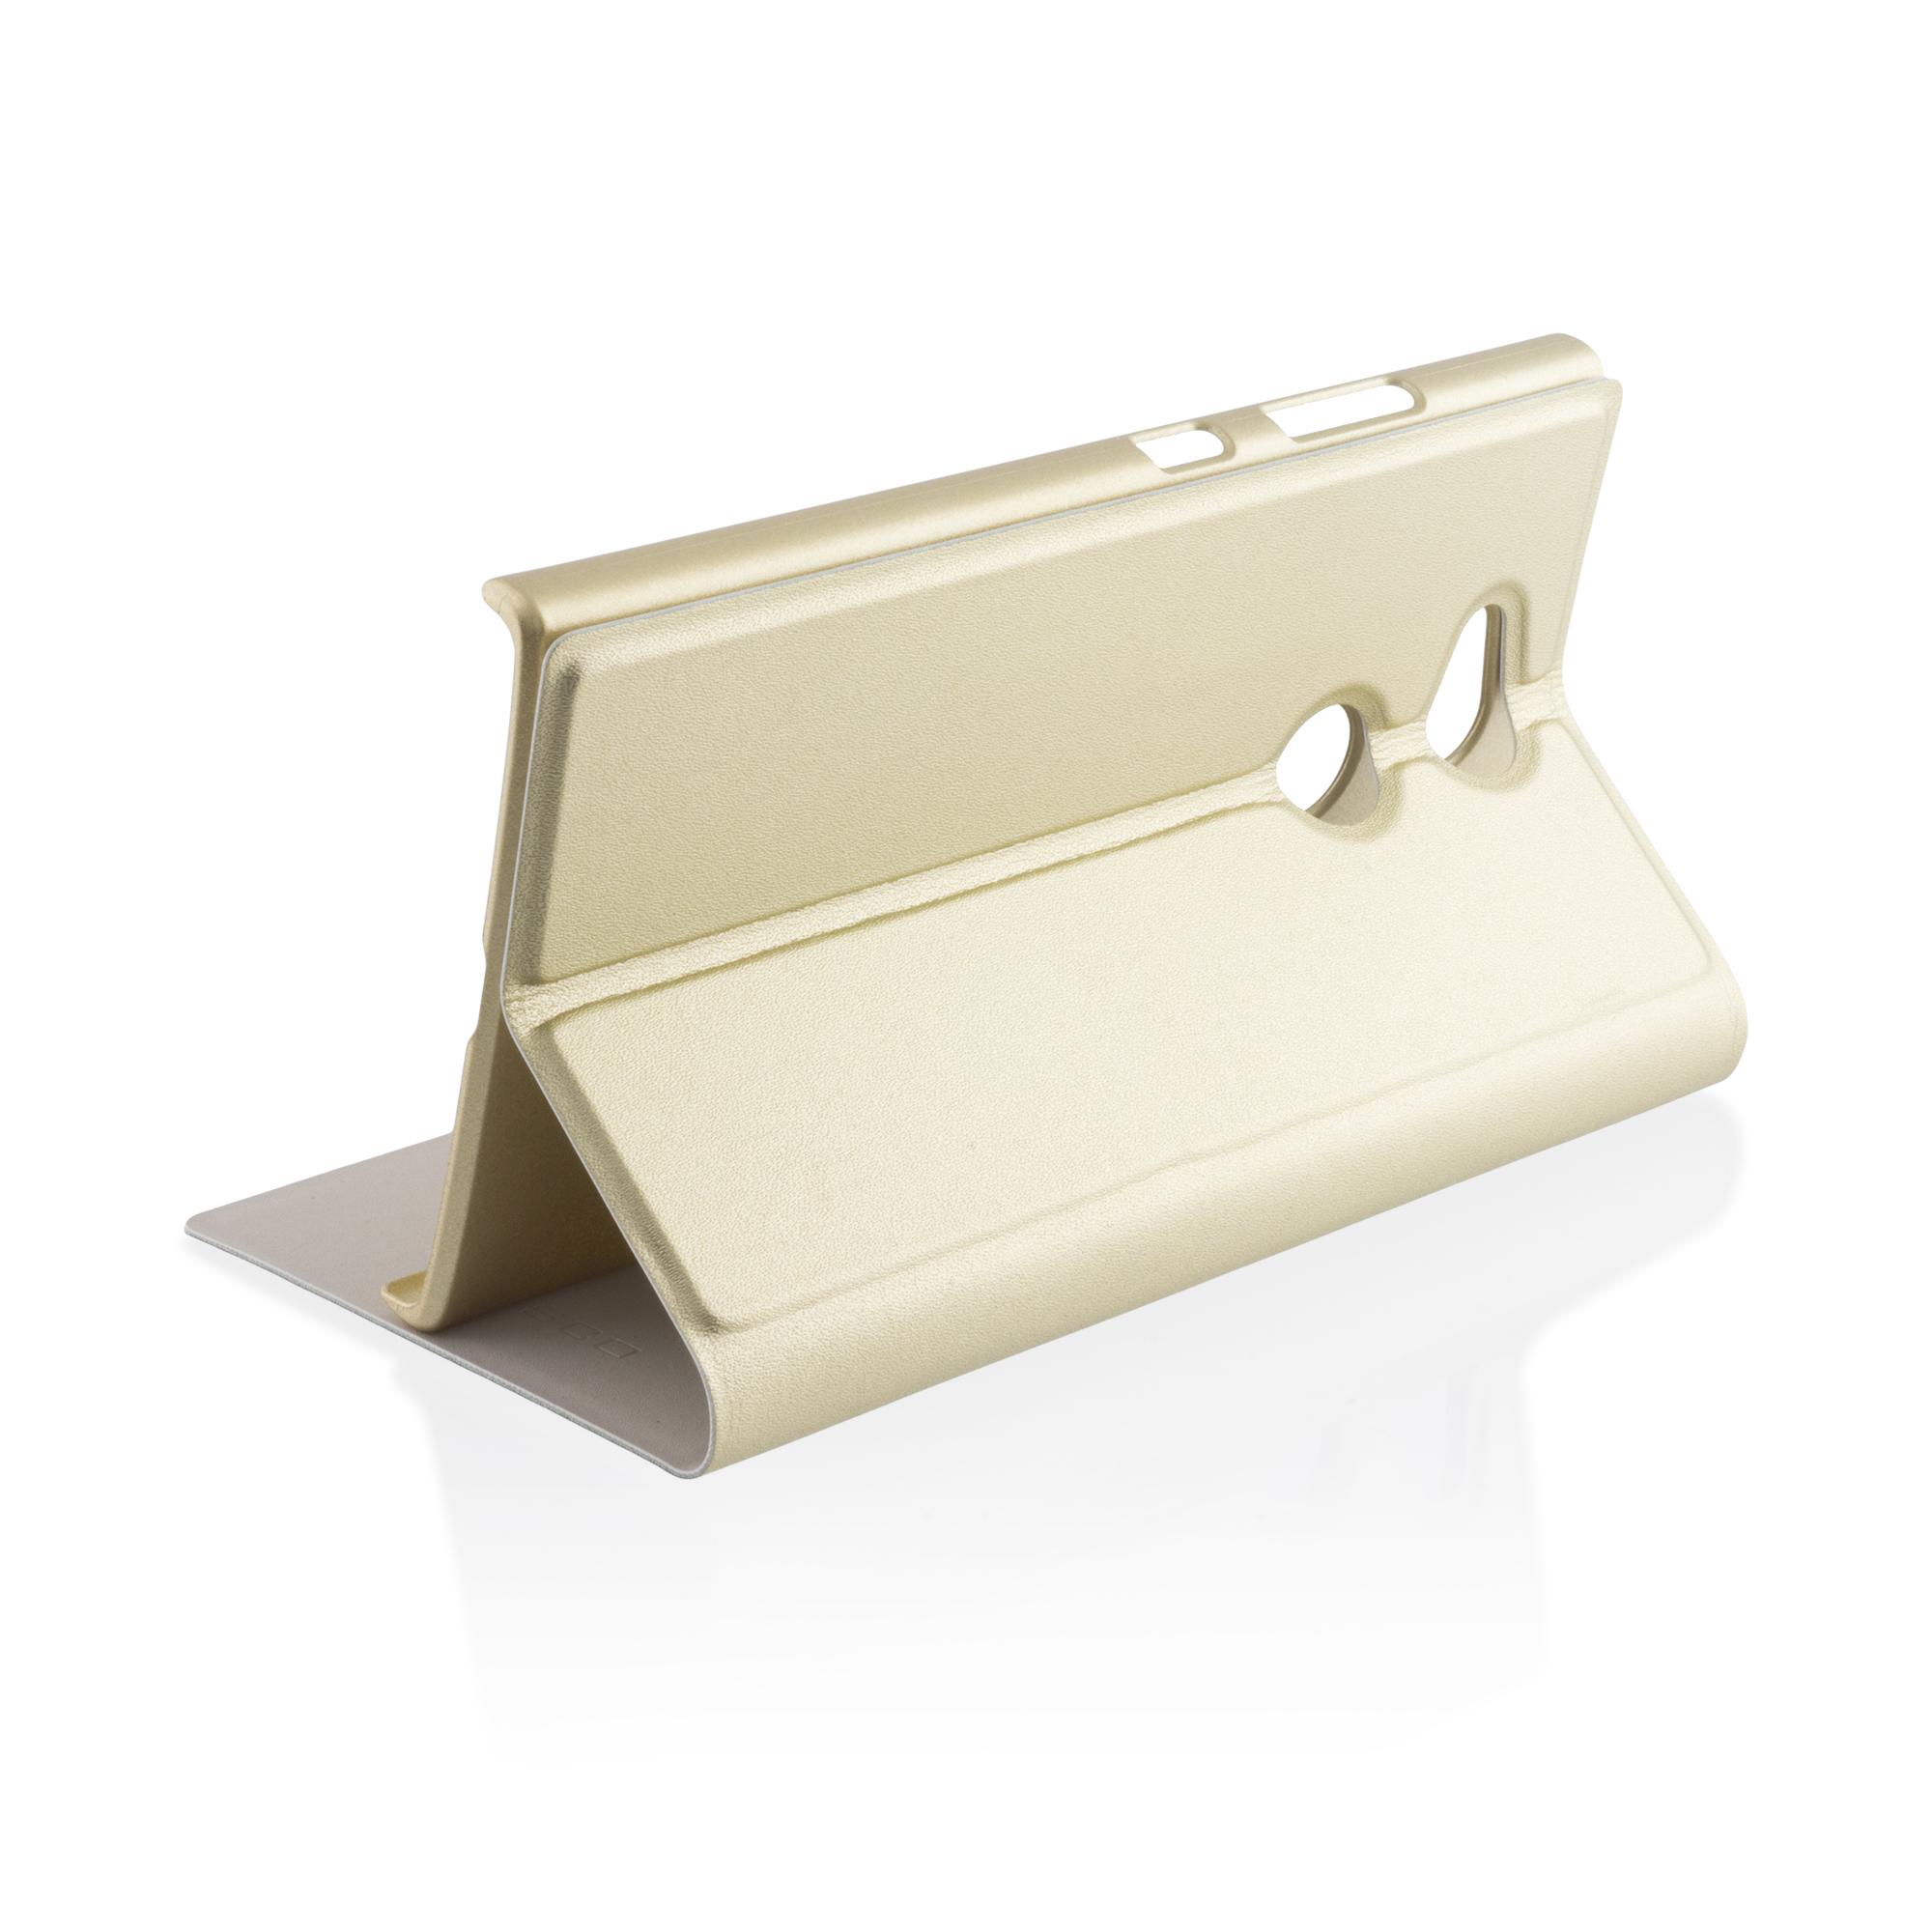 Книжка золотого цвета для Xperia L2 в Sony Centre Воронеж